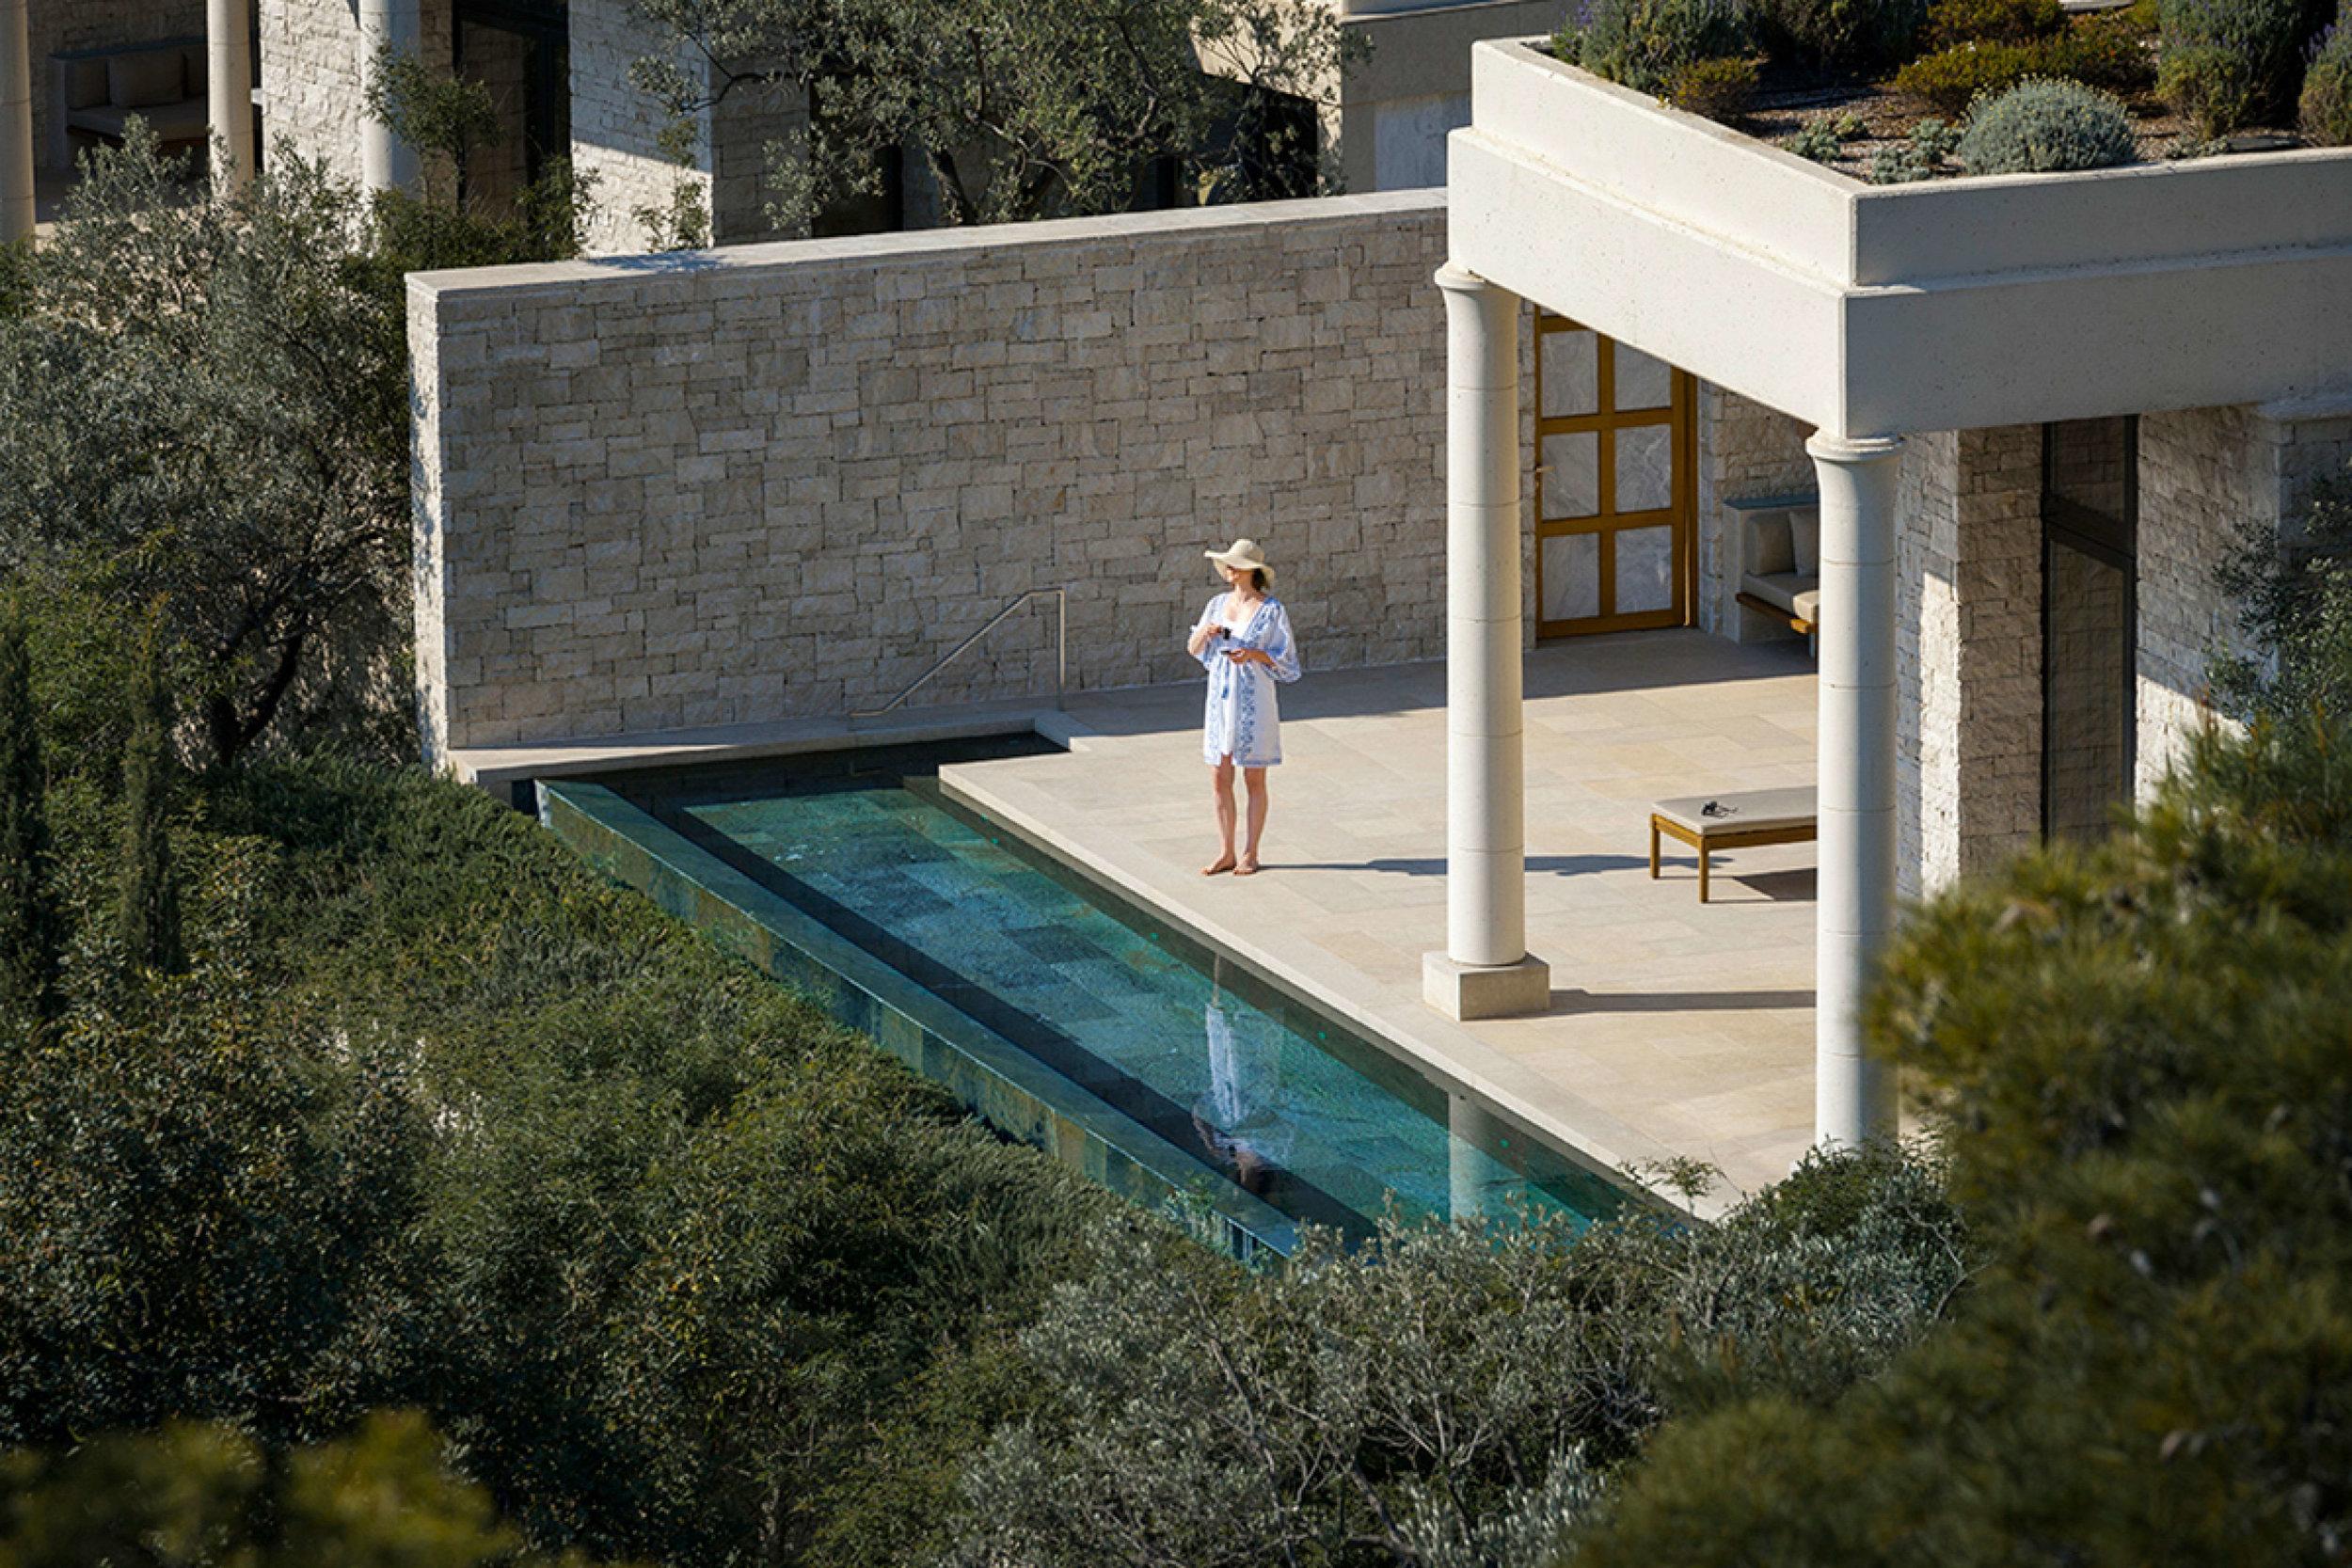 amanzoe-pavilions-1200x800.jpg